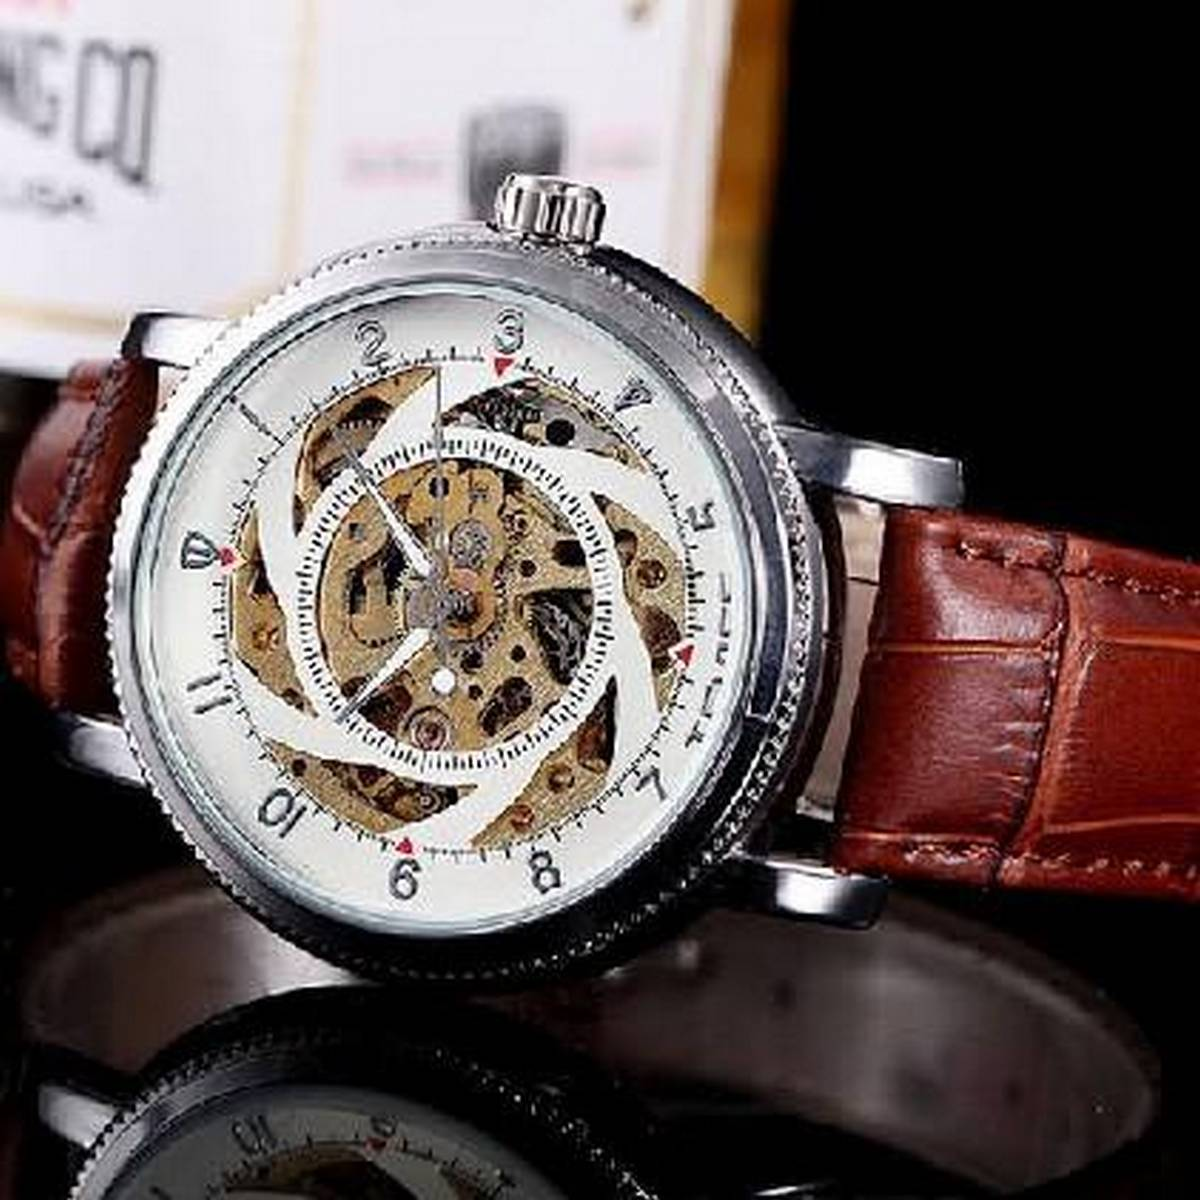 Analog Stylish For Men Mechanism Casual Wrist Watch.